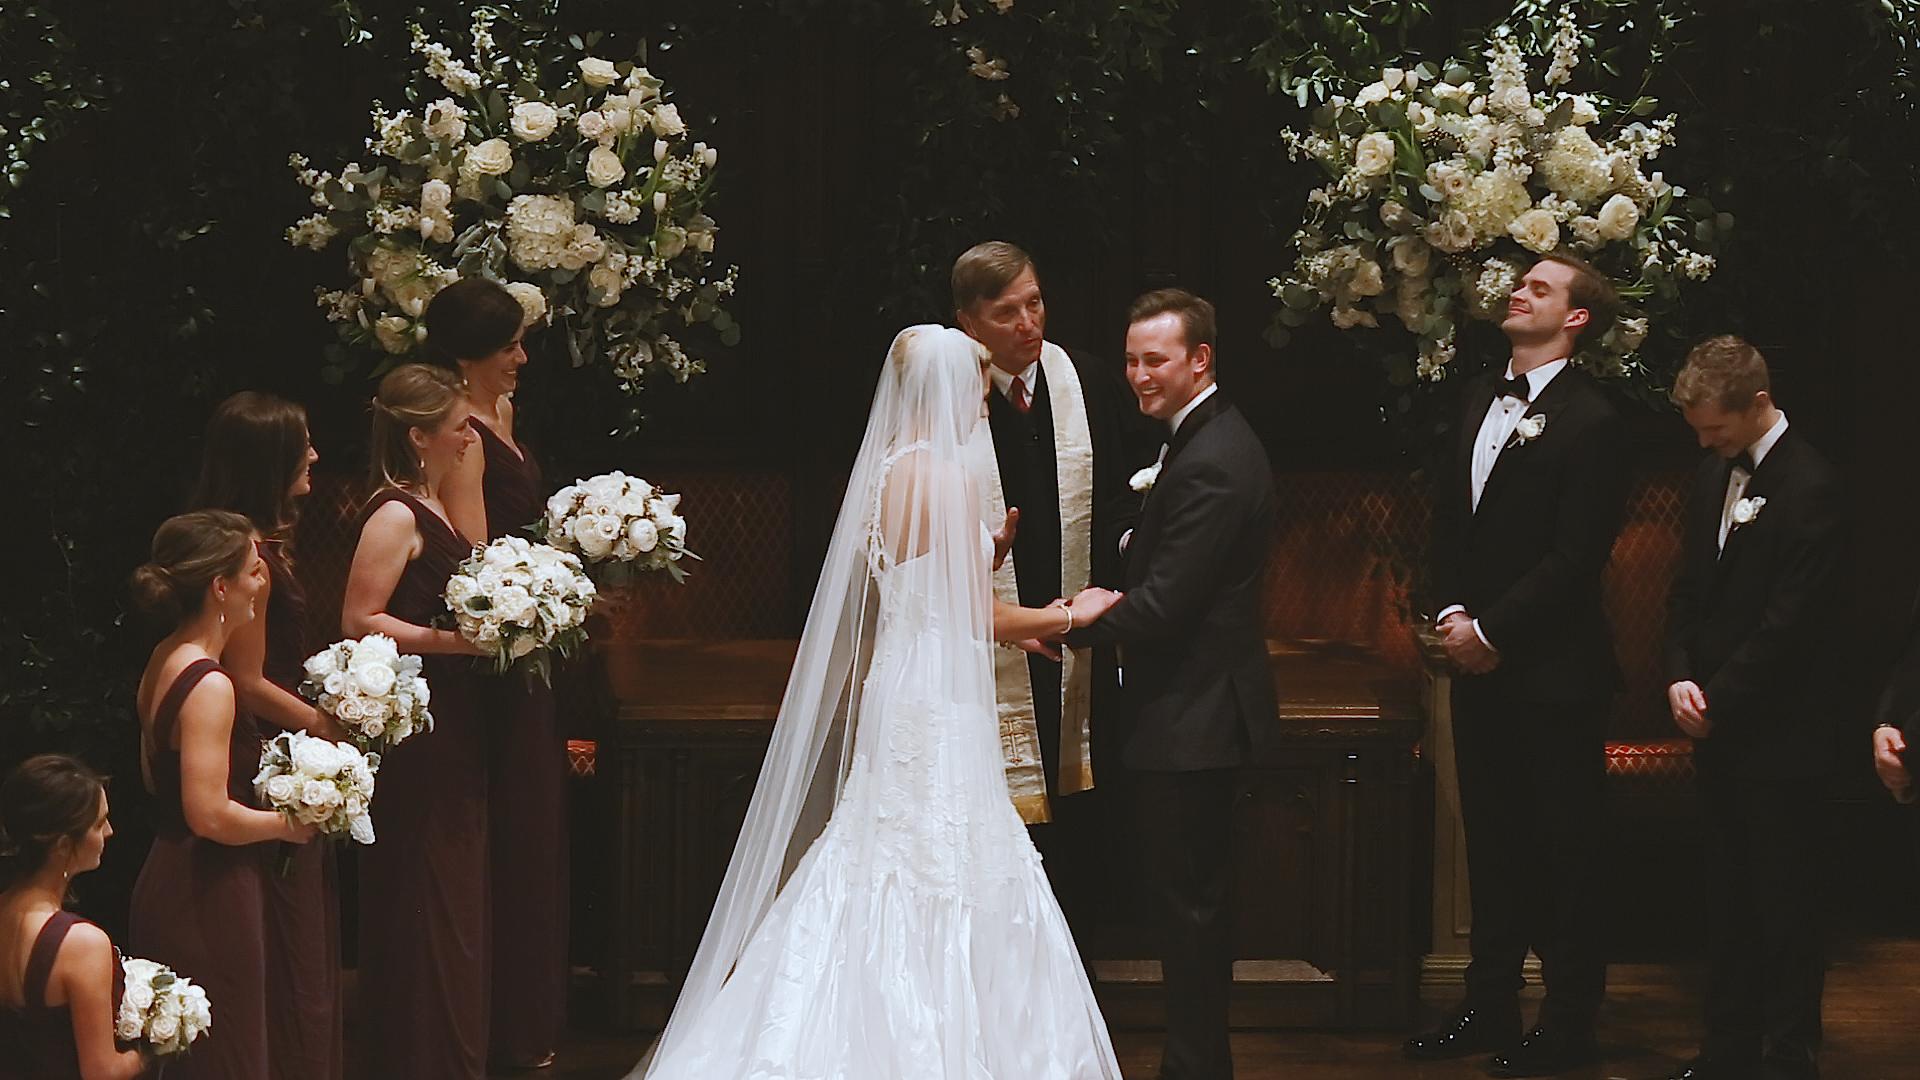 New Orelans St. Charles Presbyterian Ceremony Bride Film